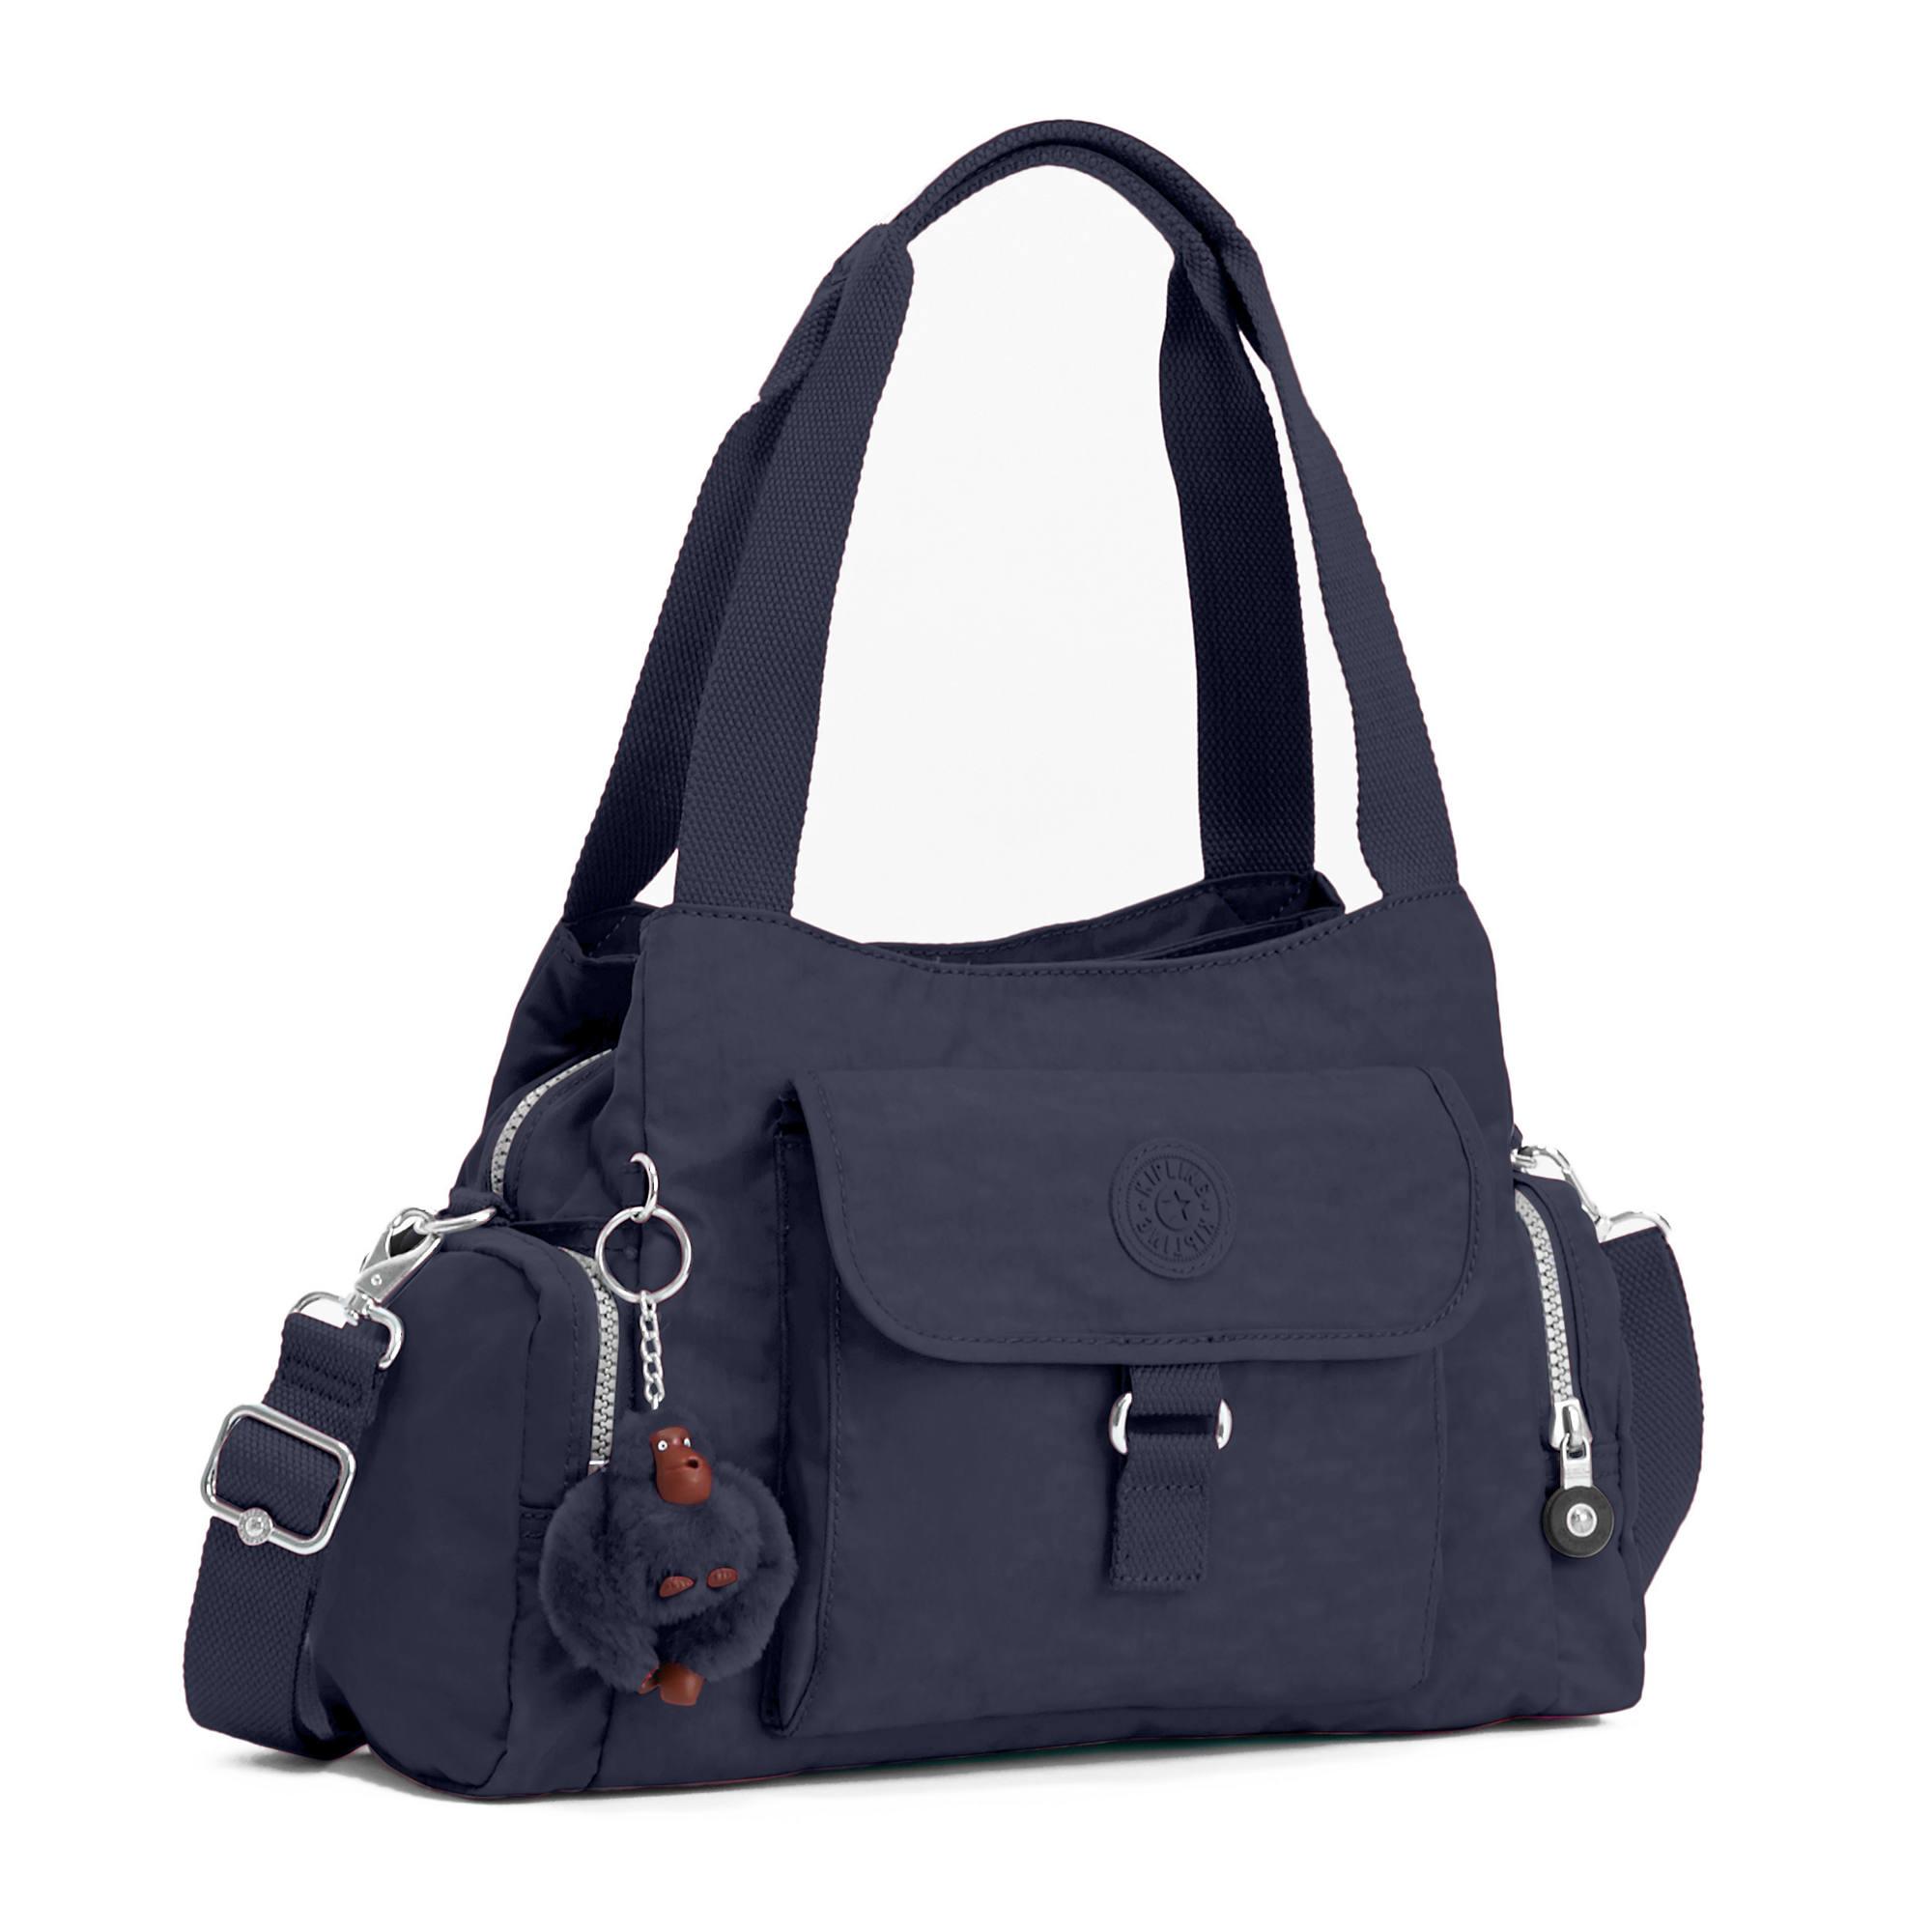 Kipling-Felix-Large-Handbag miniature 35